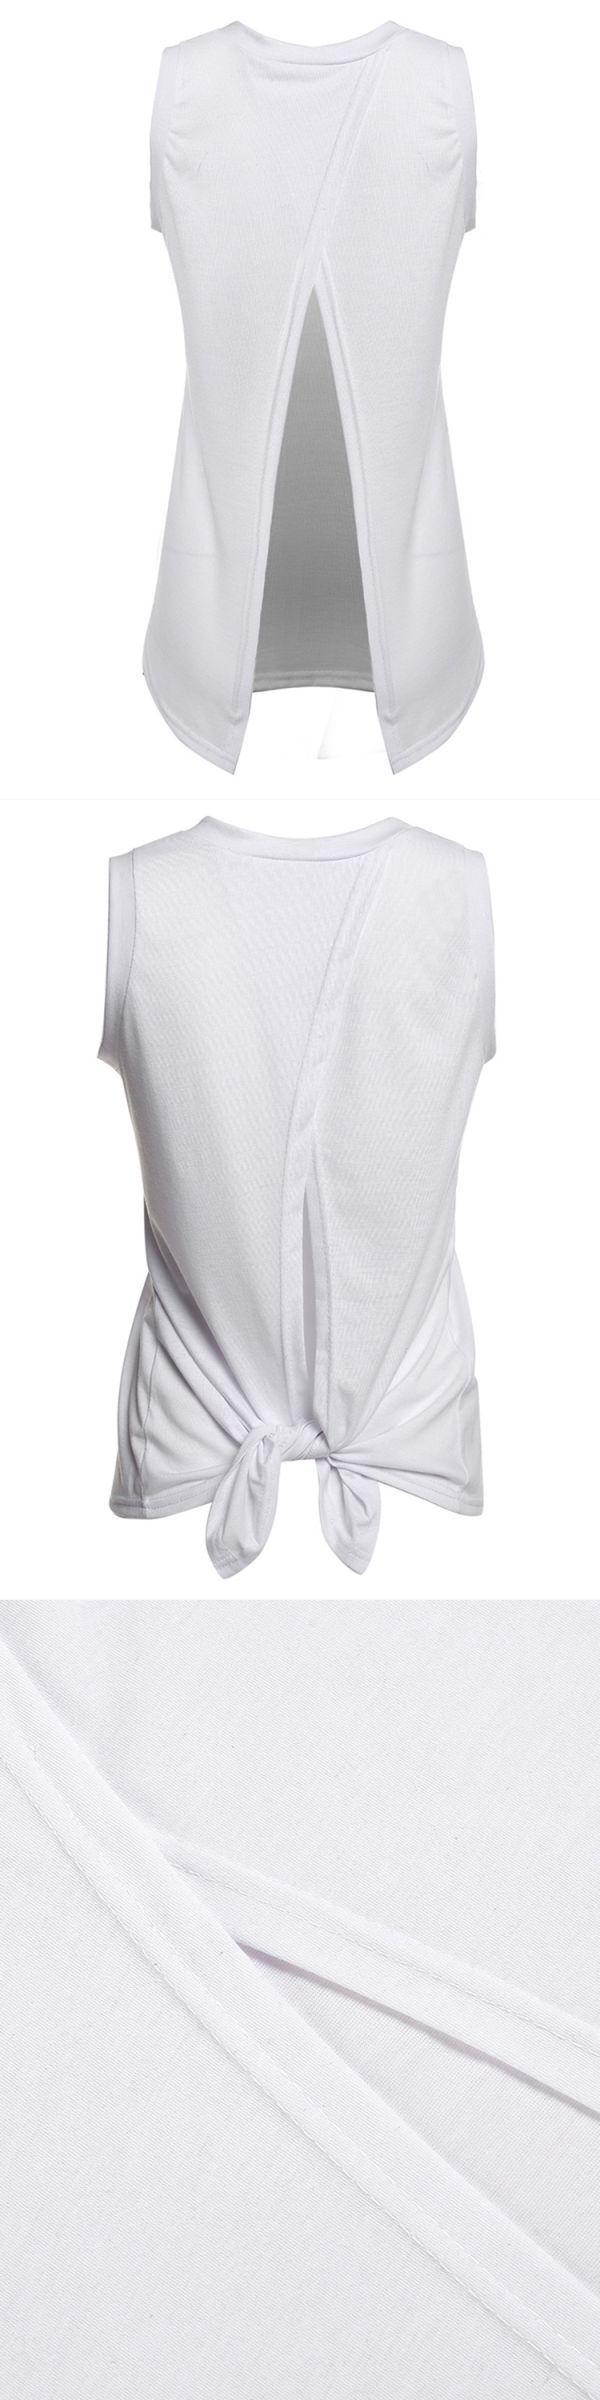 Sexy women sleeveless solid white back split cotton vest tank top champion women#8217;s tank tops #kenny #chesney #womens #tank #tops #knitted #tank #top #pattern #girl #society6 #womens #tank #tops #womens-ribbed-cotton-tank-tops-3